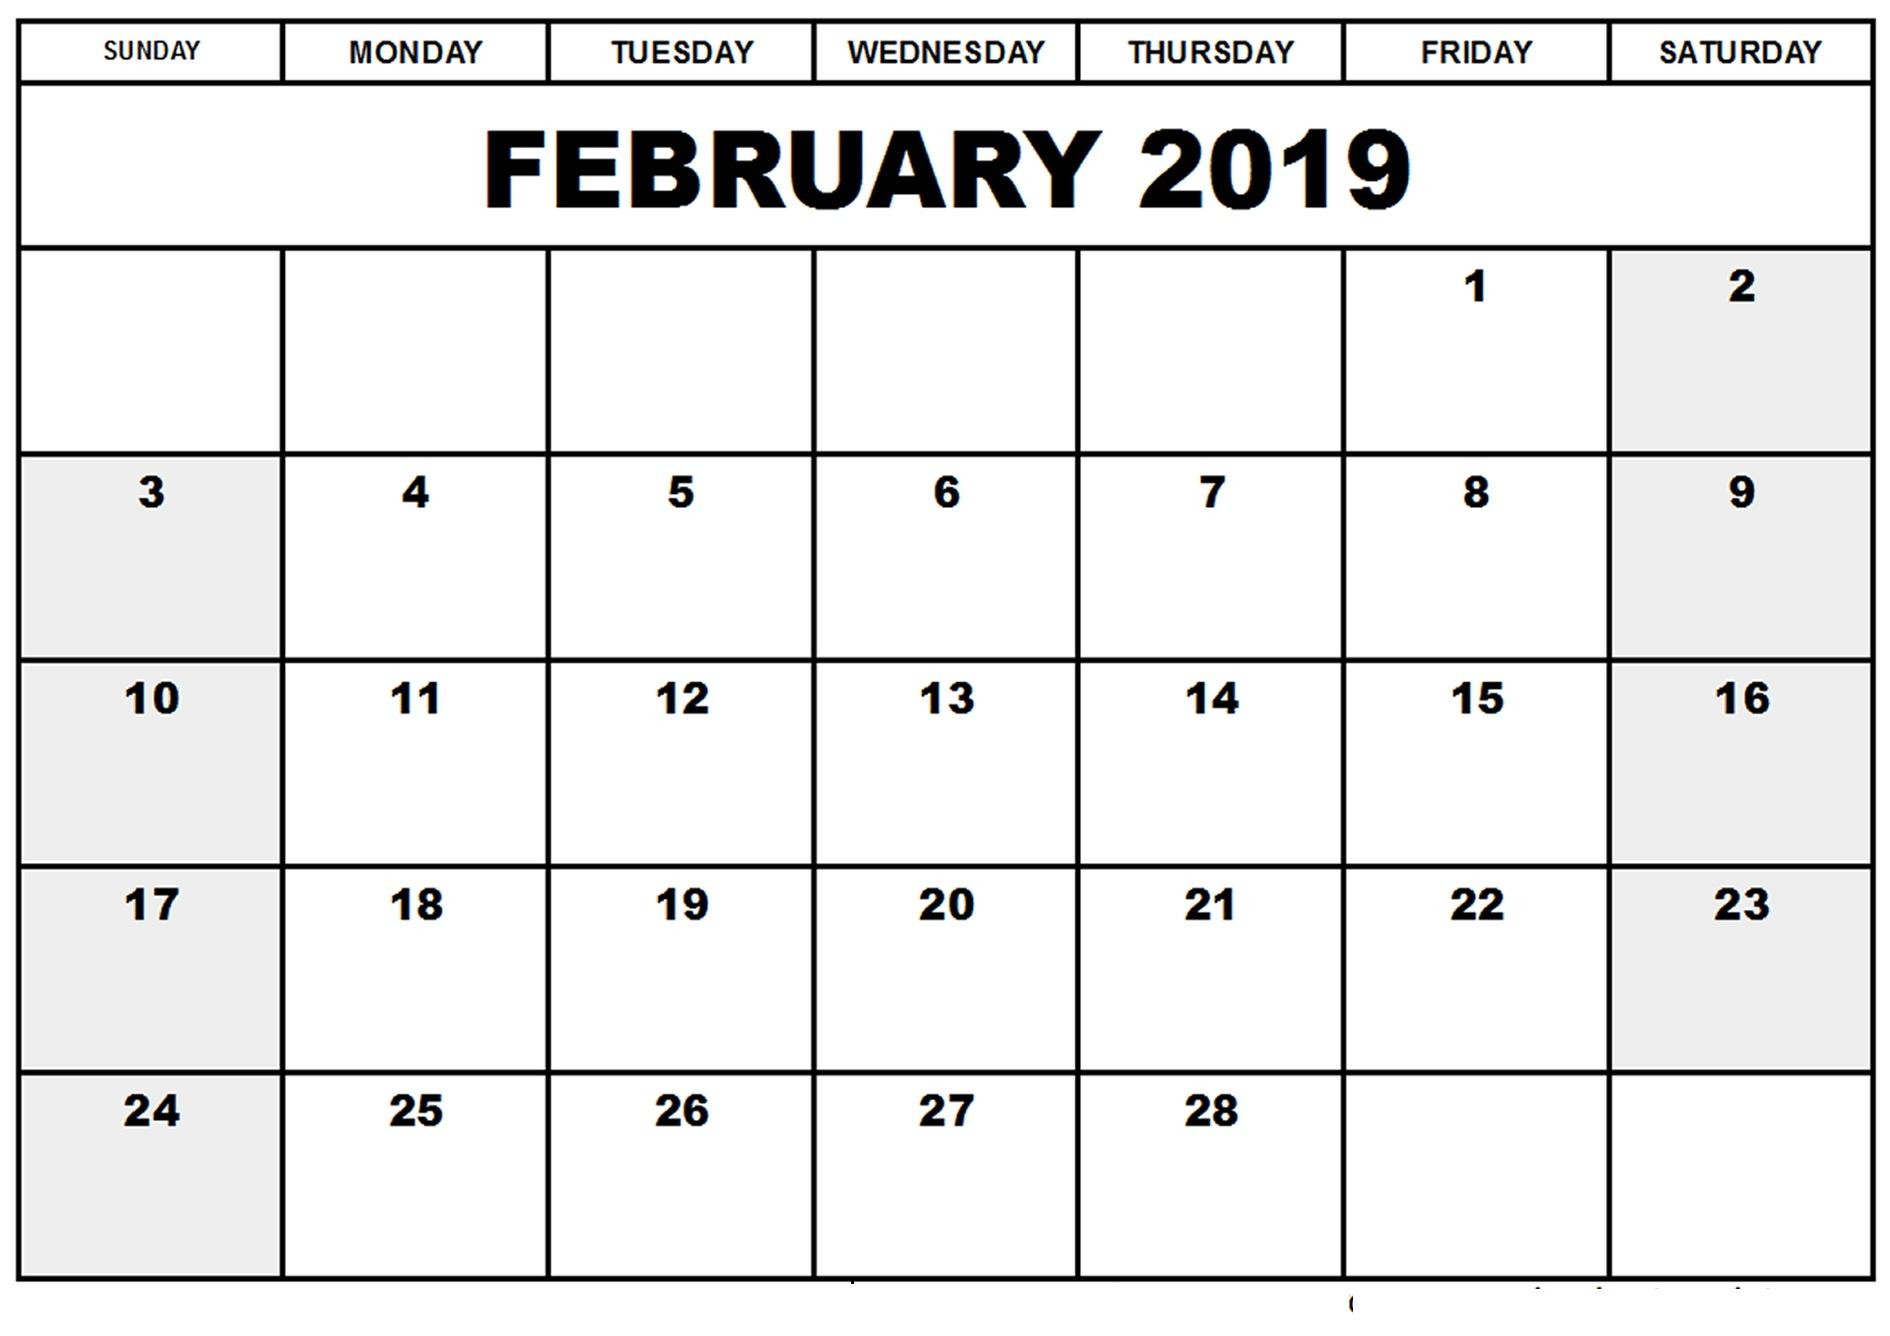 online february 2019 calendar editable free online calendars::February 2019 Calendar Editable